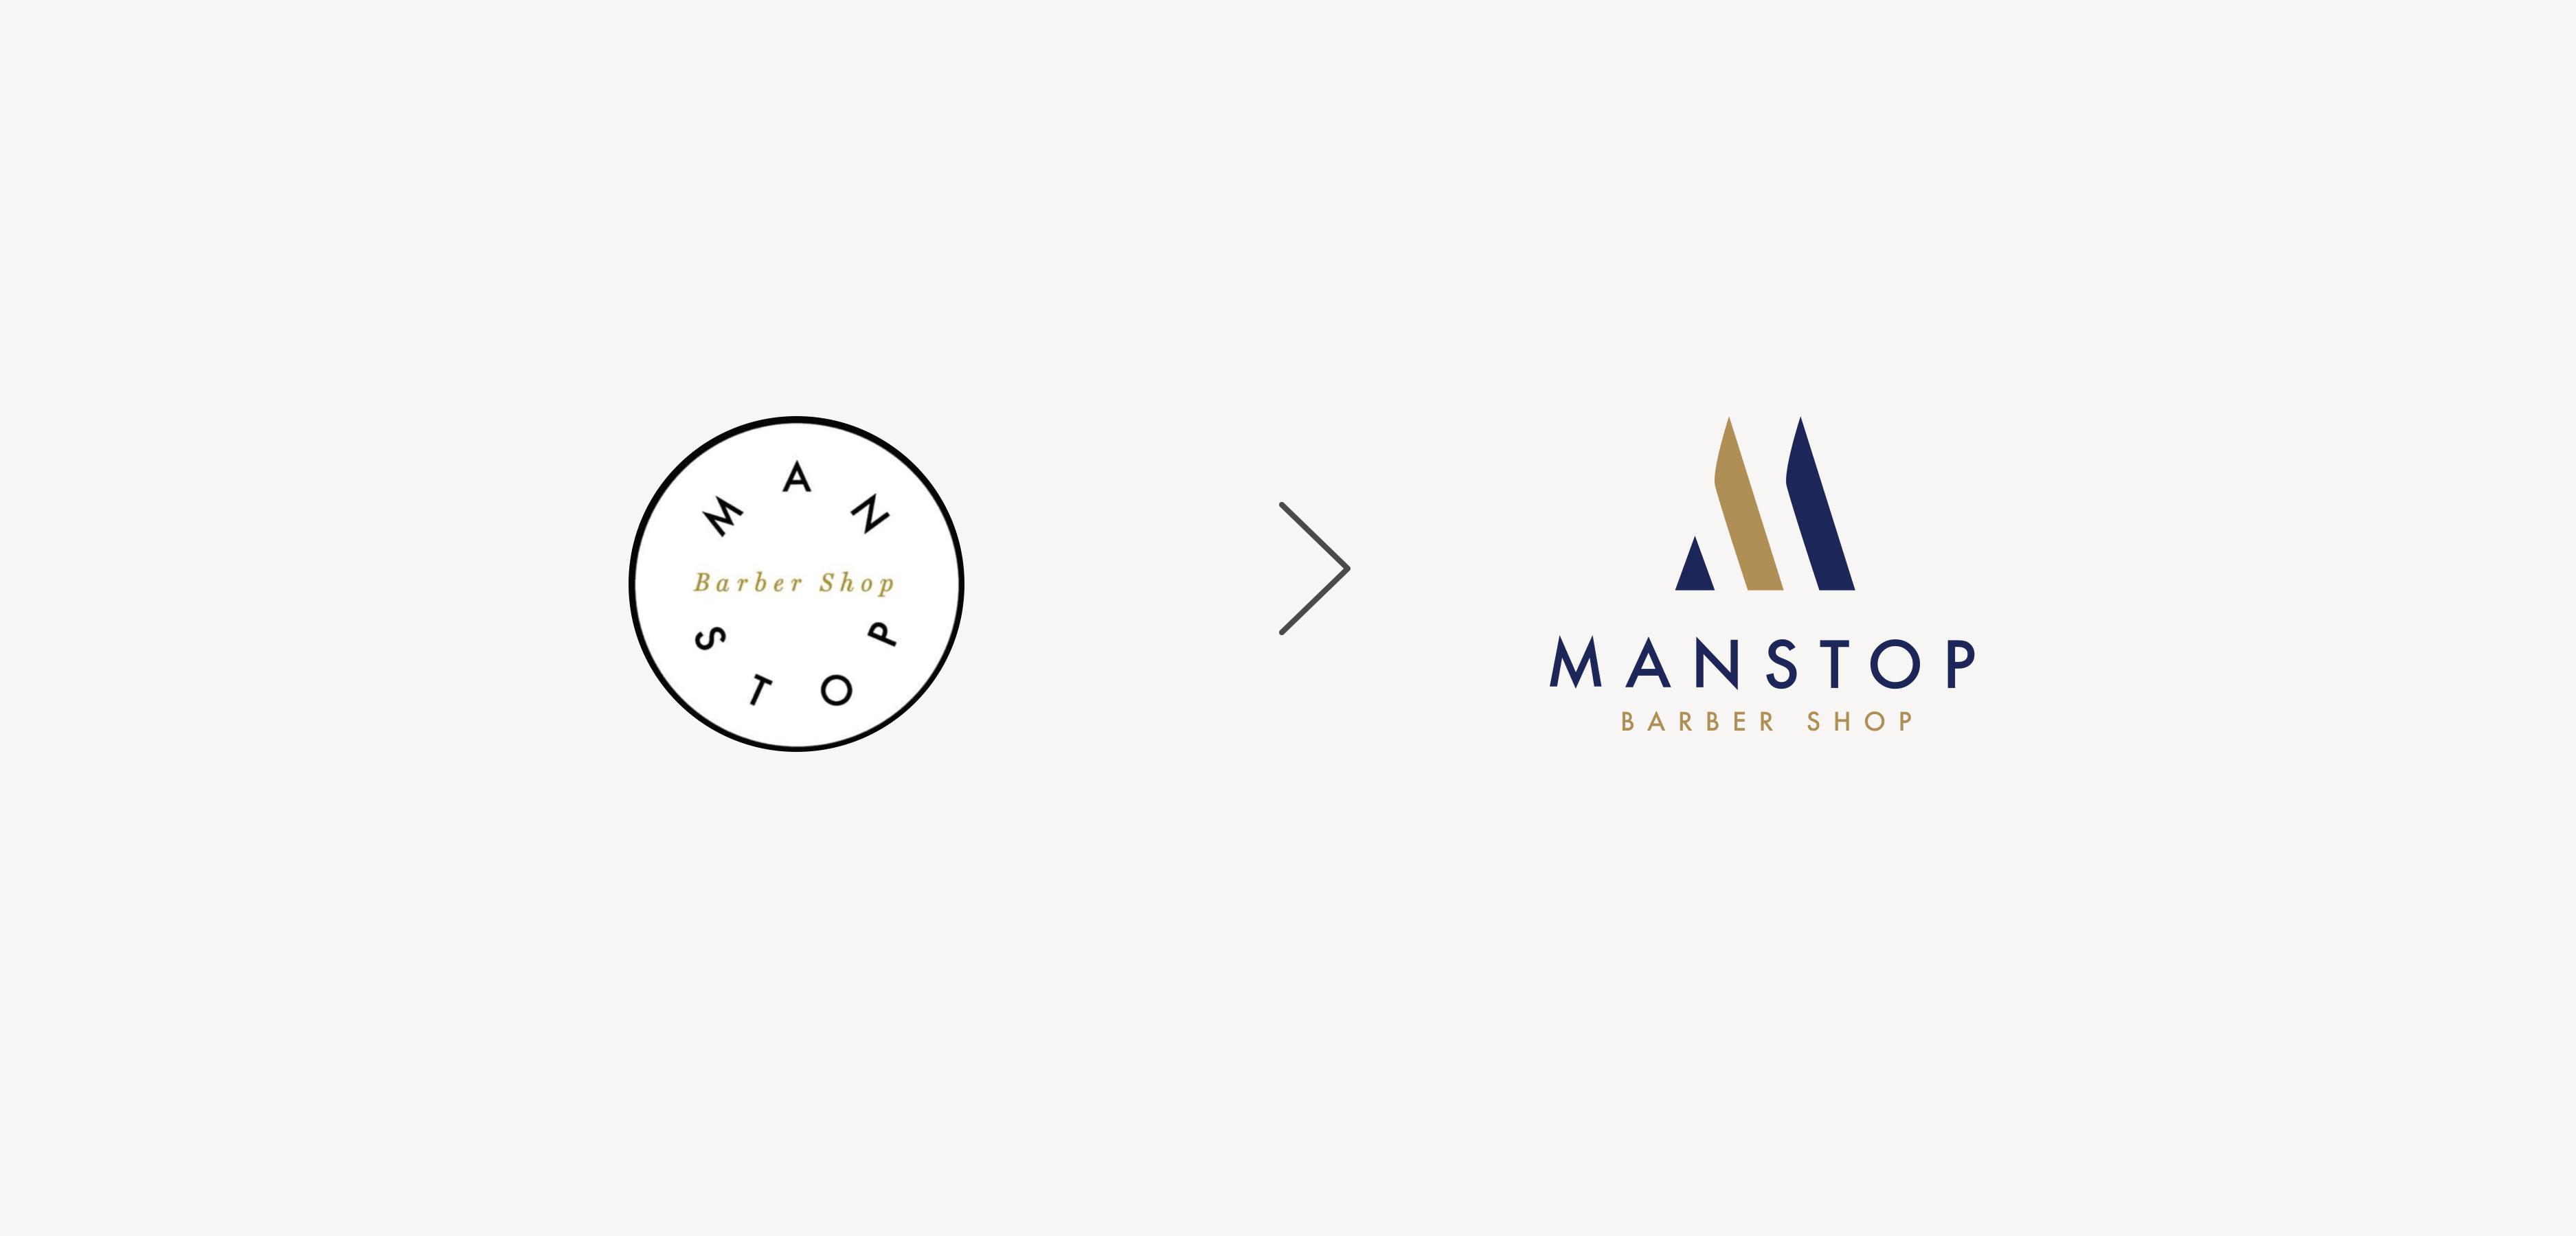 TAKEOFF_BRANDING_Manstop-4a